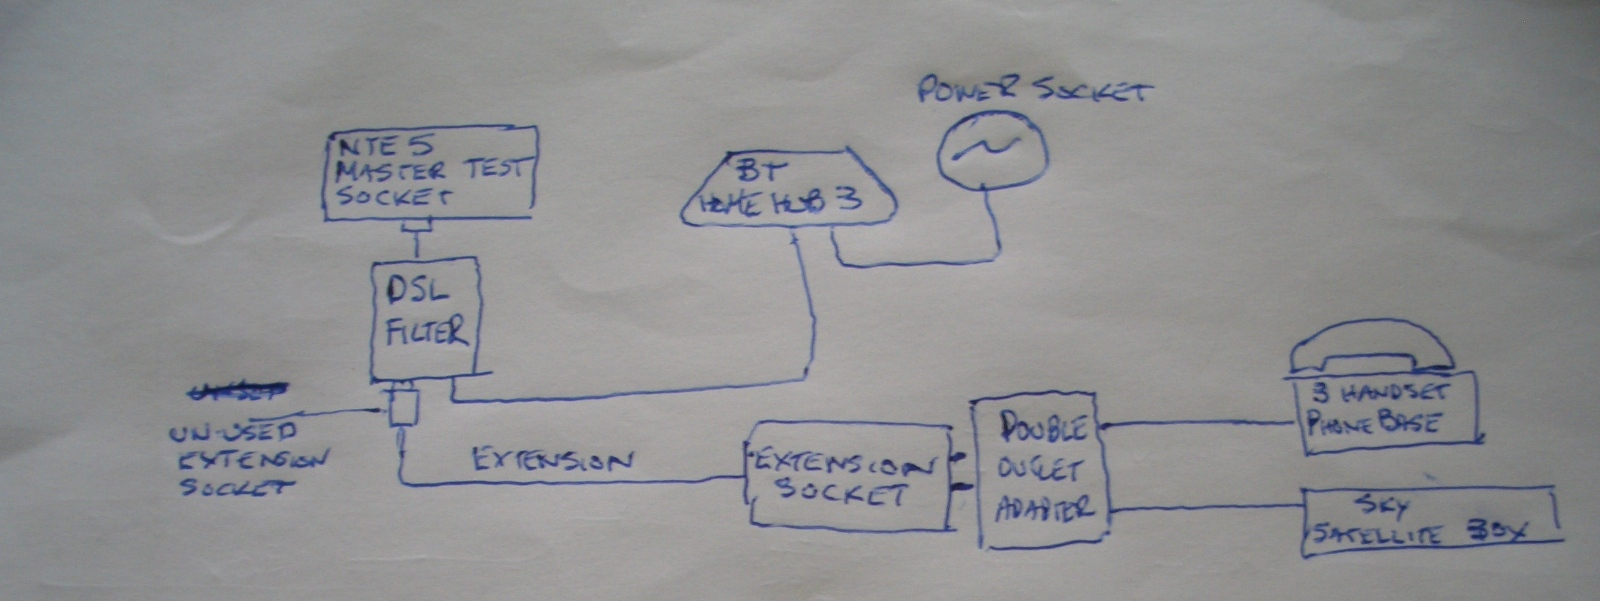 hight resolution of bt infinity wiring diagram wiring diagram blog passive optical network bt infinity wiring diagram